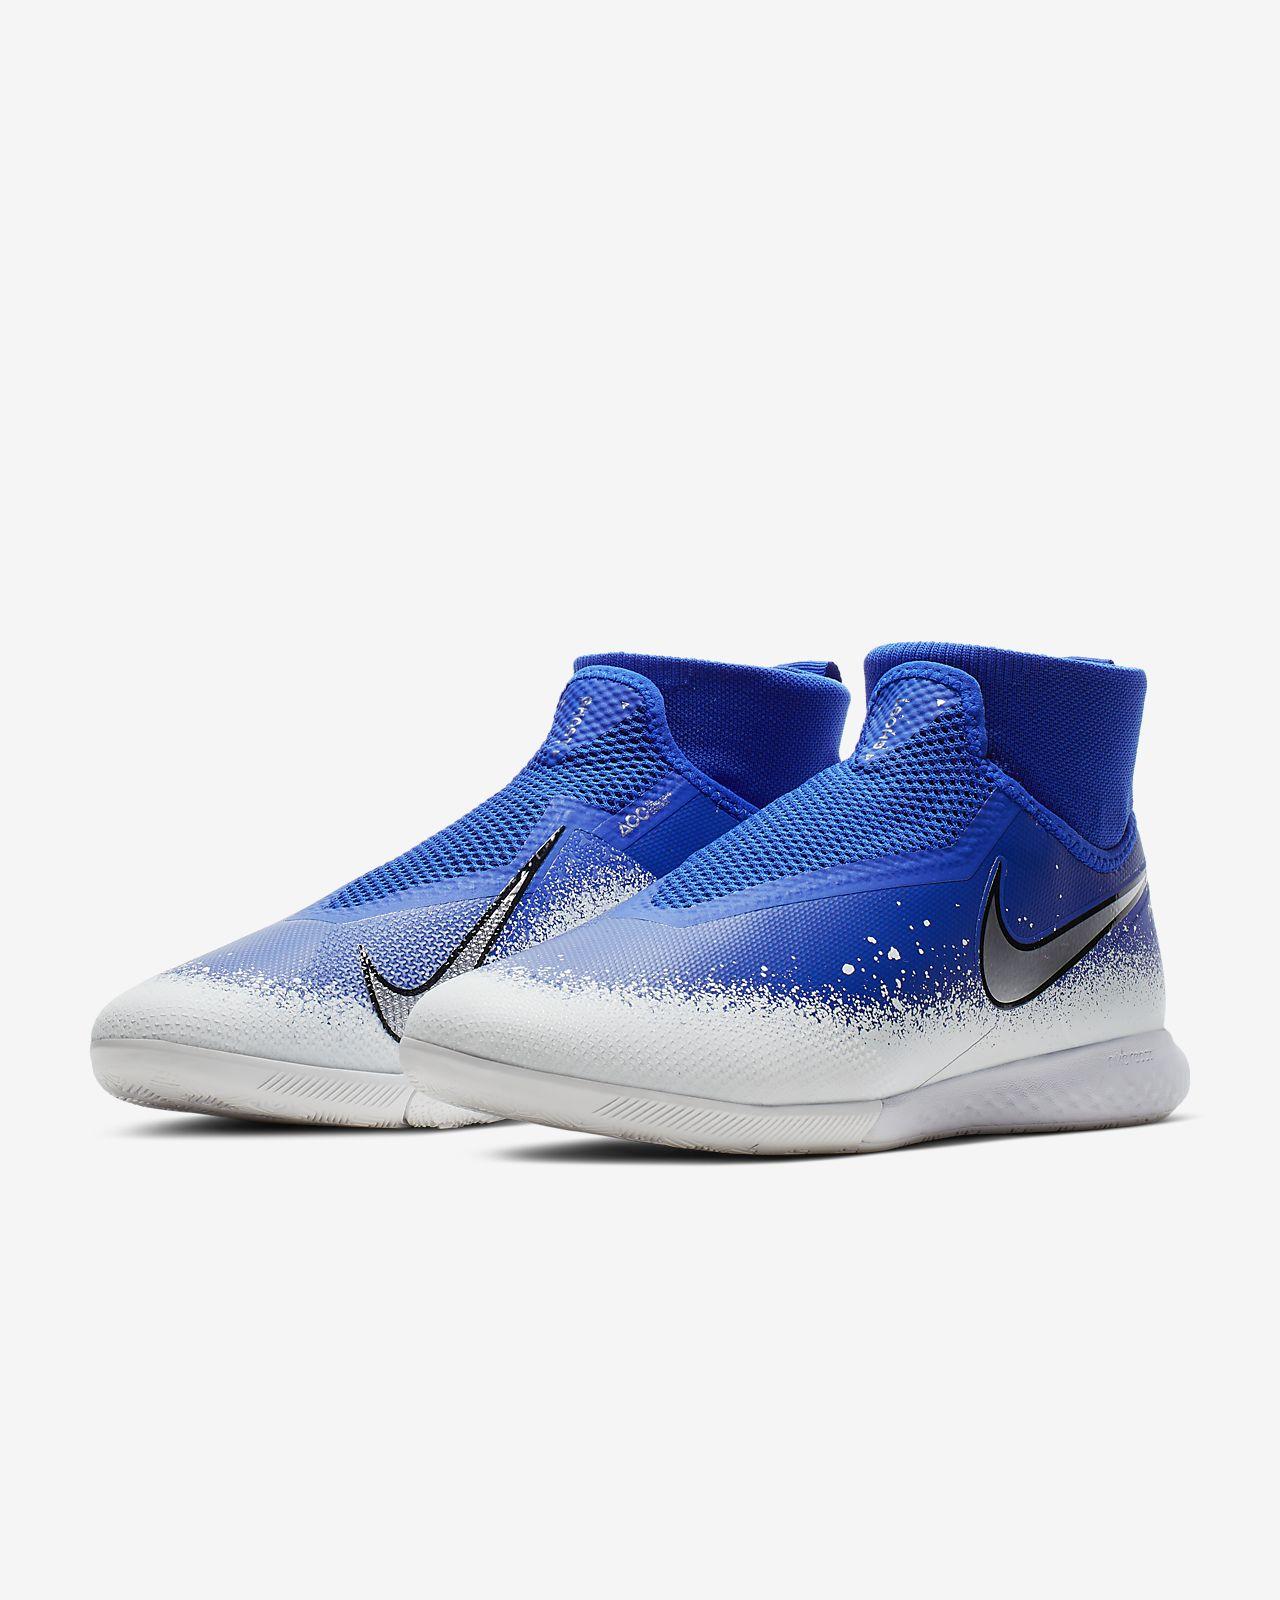 info for 01a22 89b10 ... Zaalvoetbalschoen Nike React Phantom Vision Pro Dynamic Fit IC  Zaalvoetbalschoen